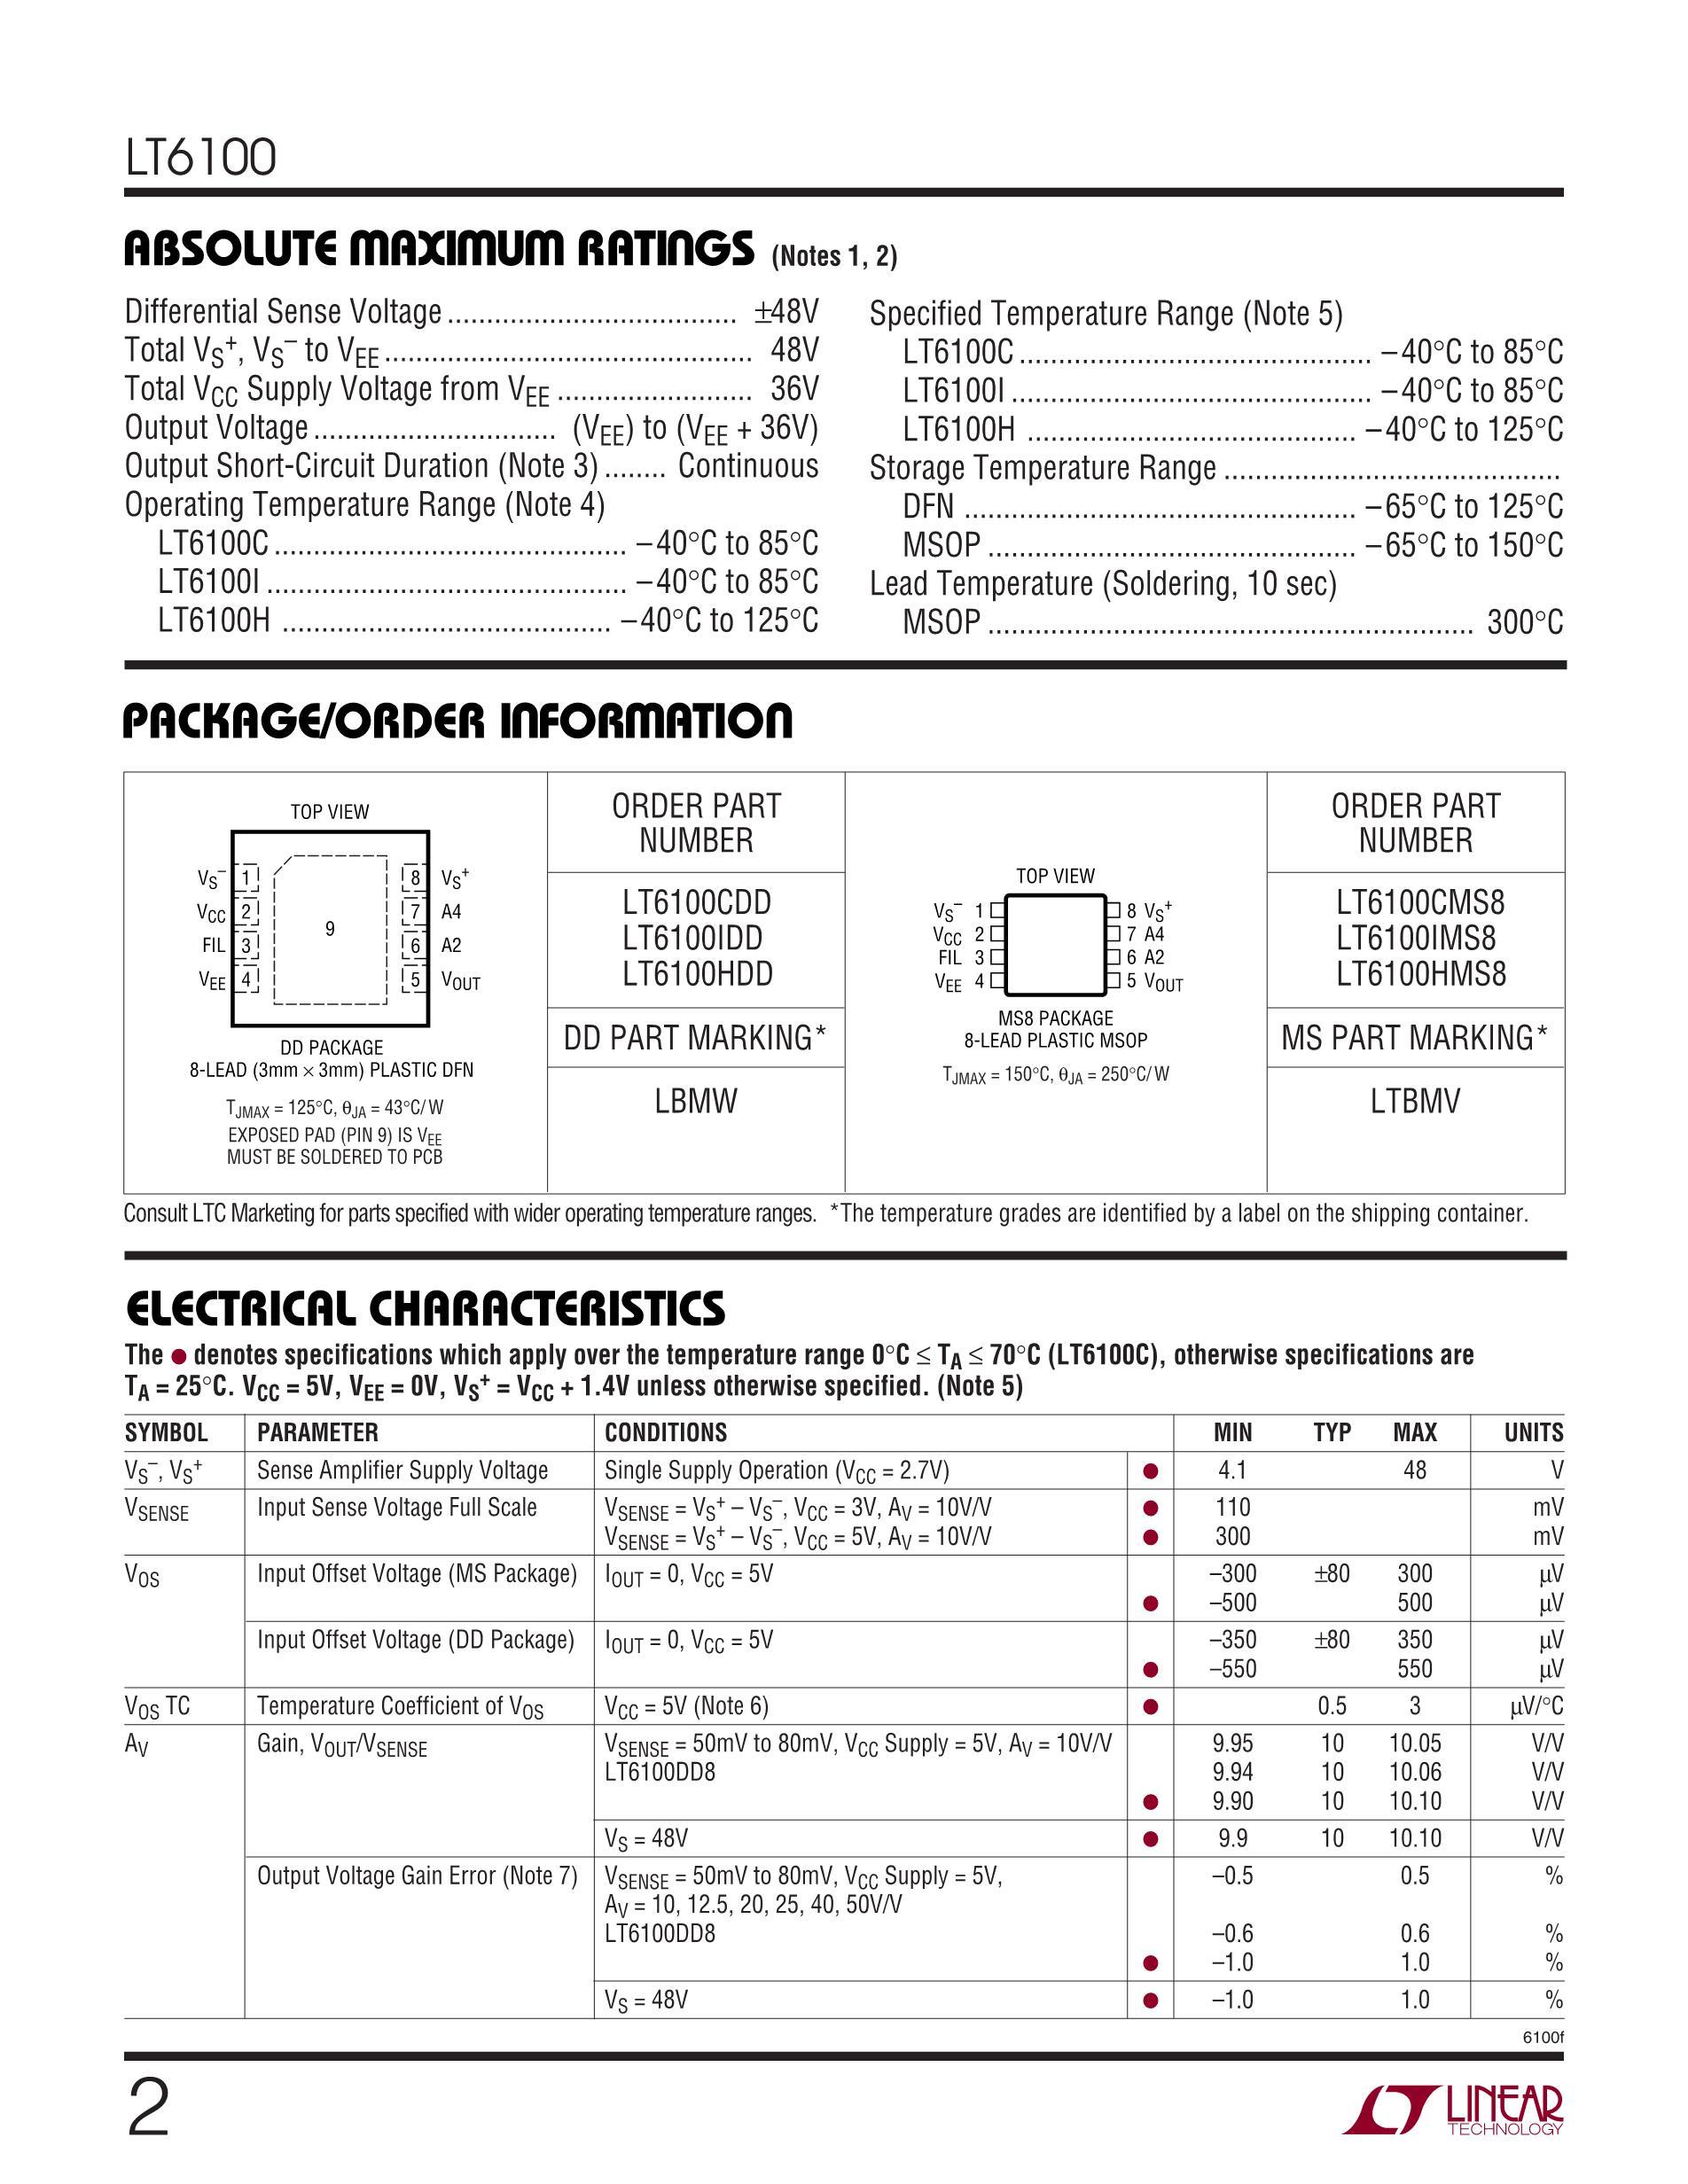 LT6108AIMS8-1#PBF's pdf picture 2